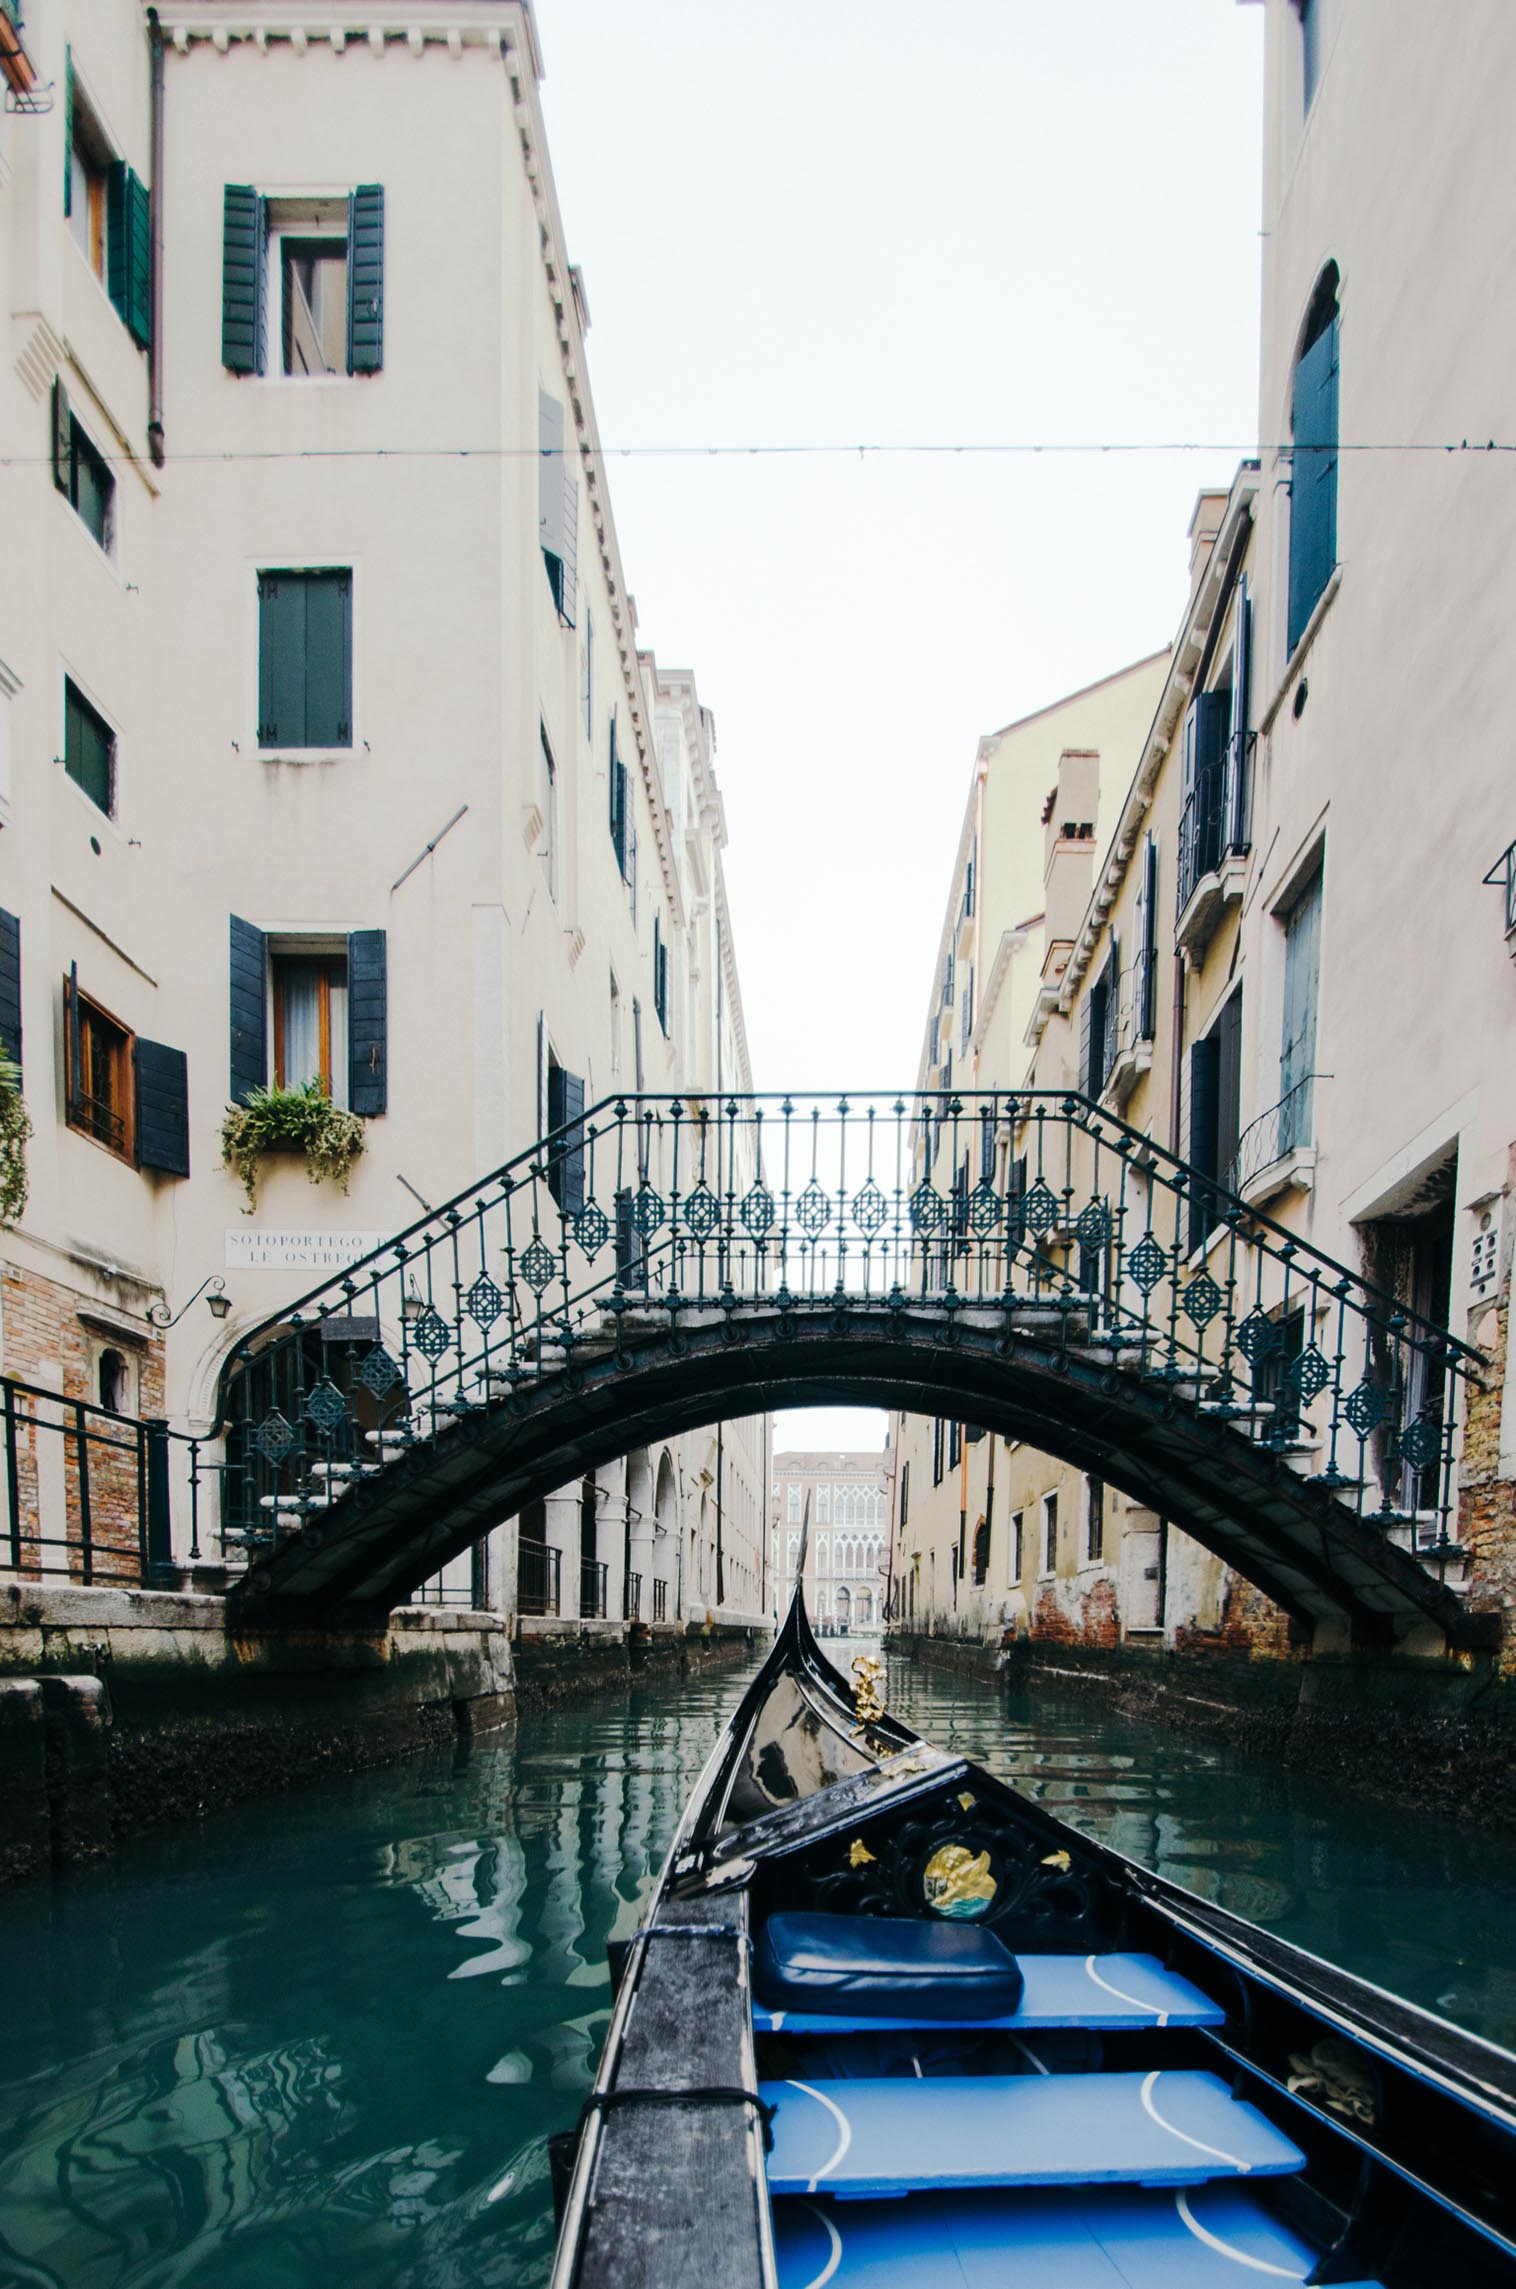 AdamSzafranski-Venice-Italy-025.jpg